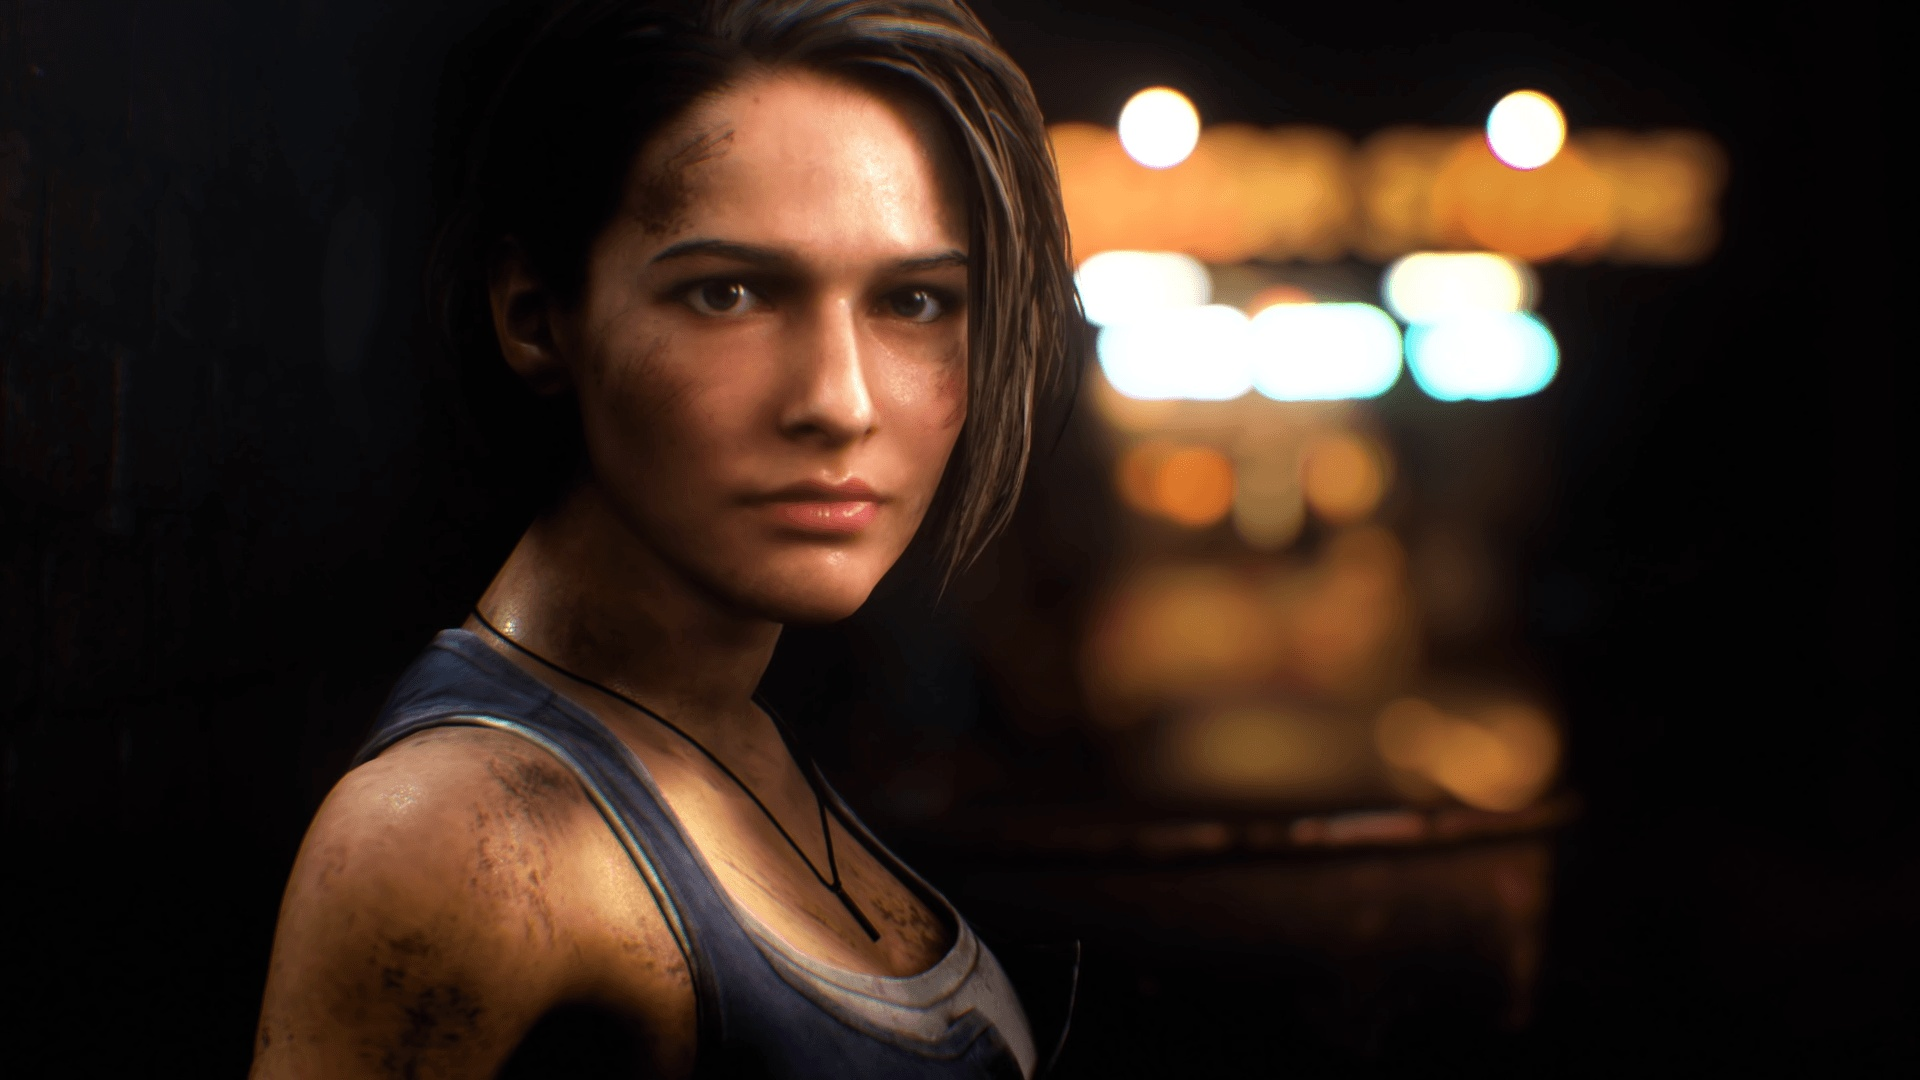 Ремейк Resident Evil3 стартовал в Steam слабее ремейка Resident Evil2